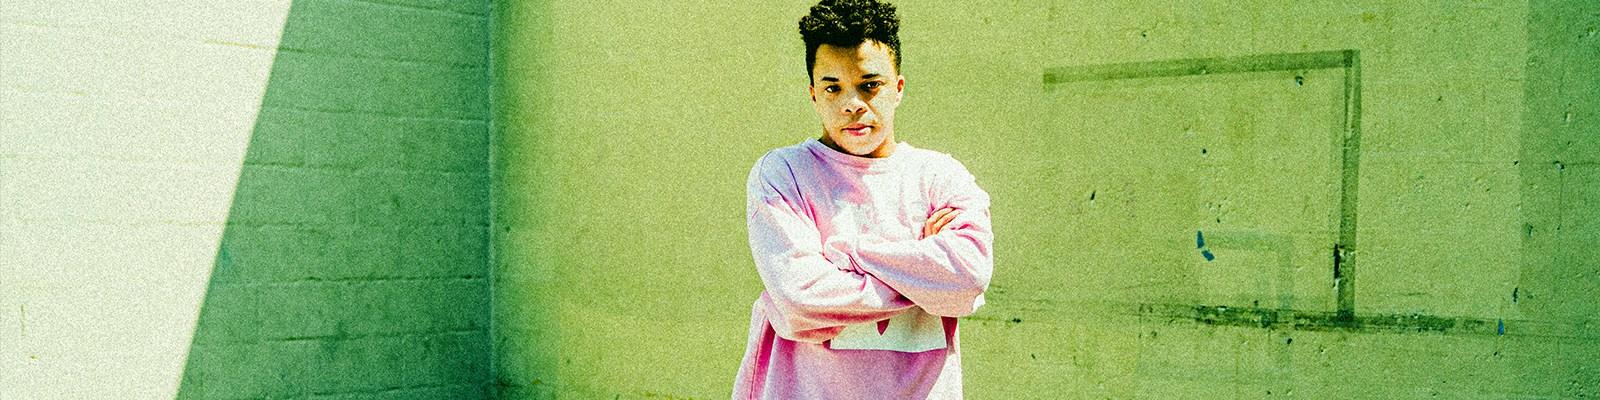 Amorphous And His Musical Ascension Goes Beyond Viral Mash-Ups